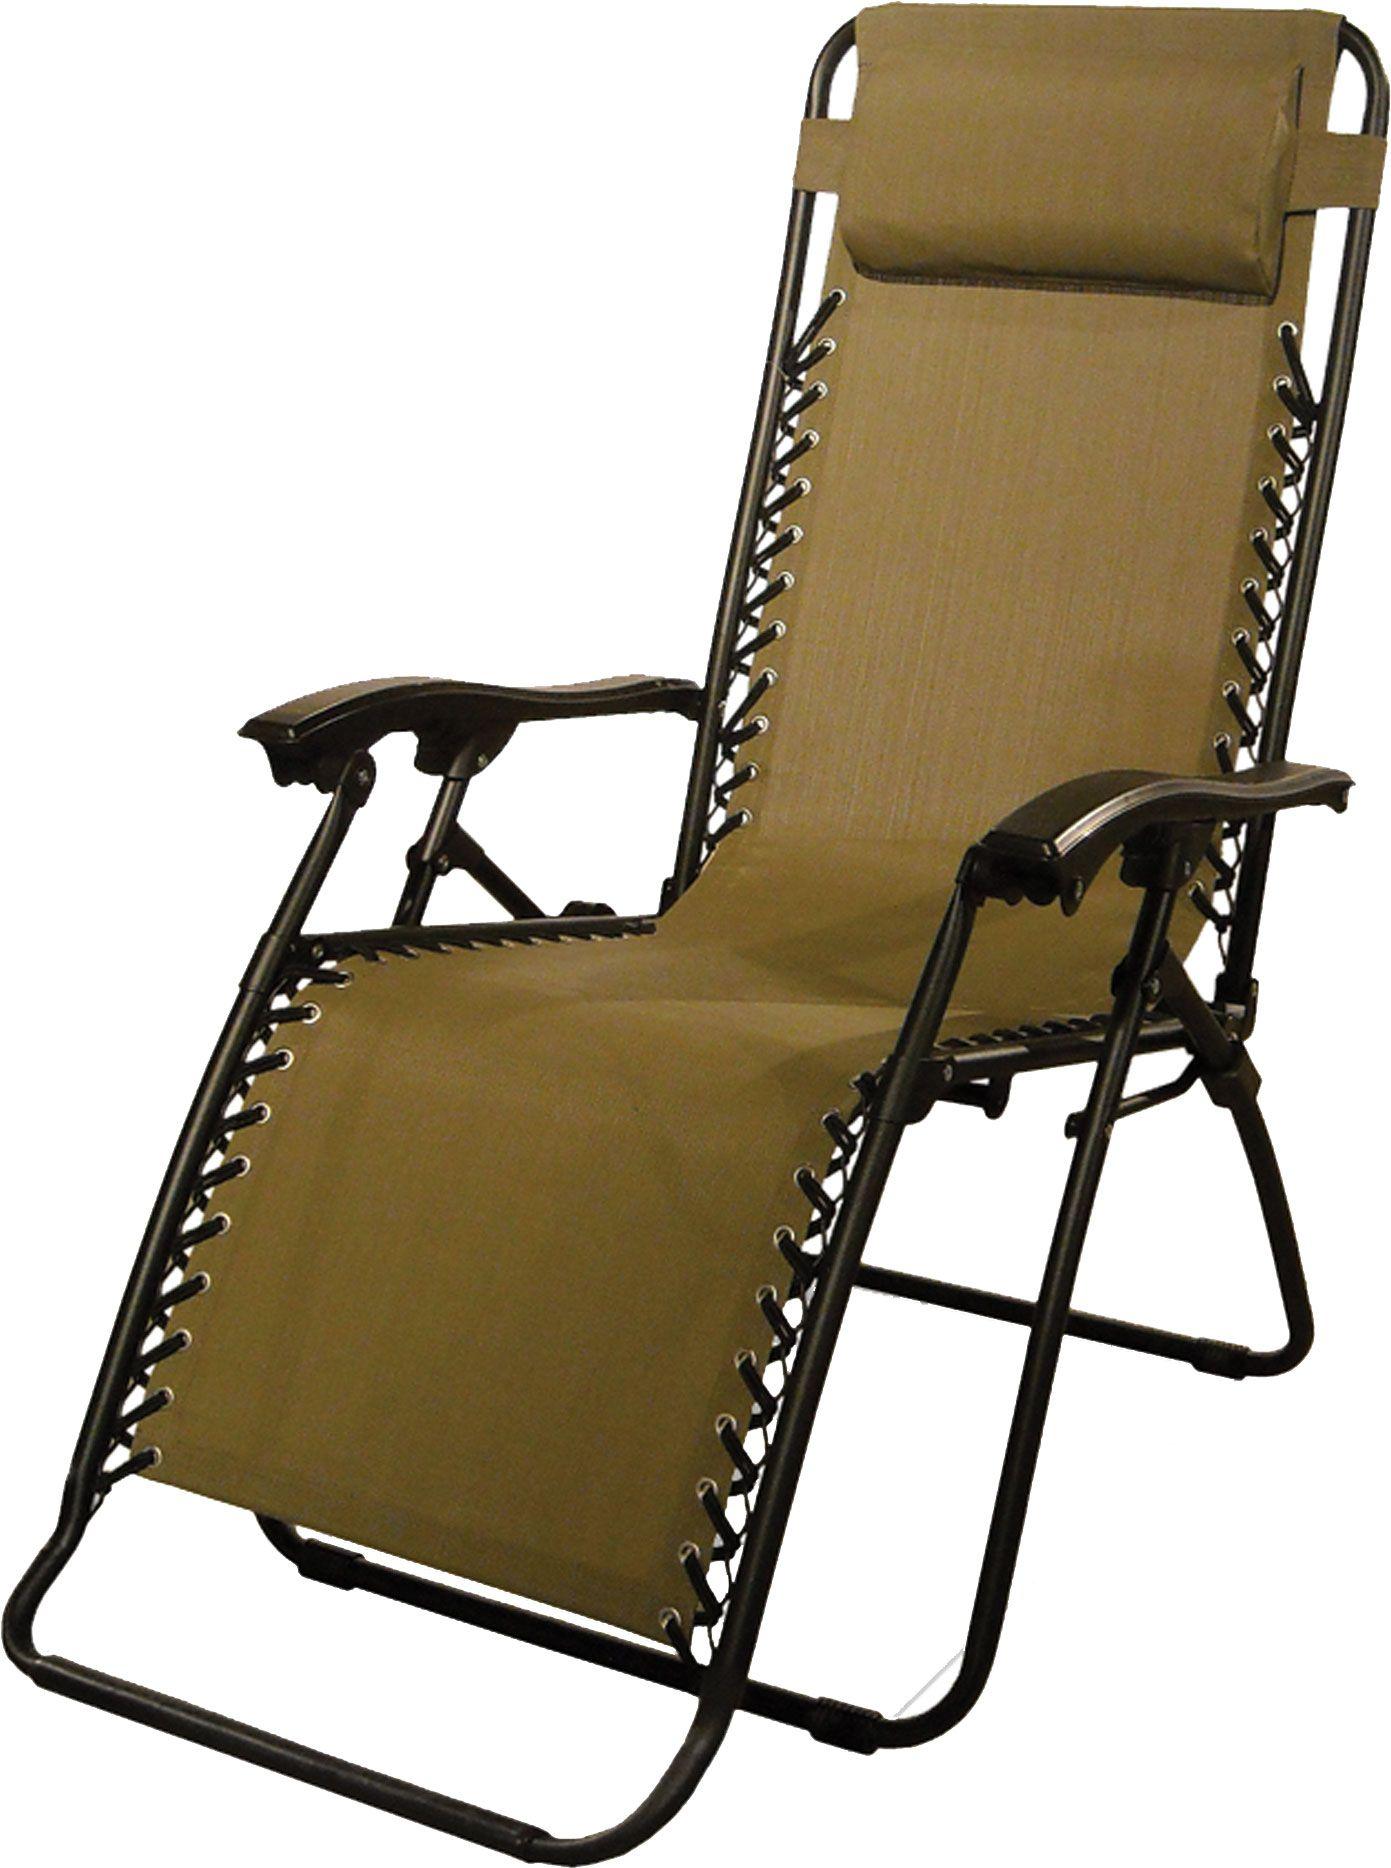 chair workstation orig gravity antigravity zero